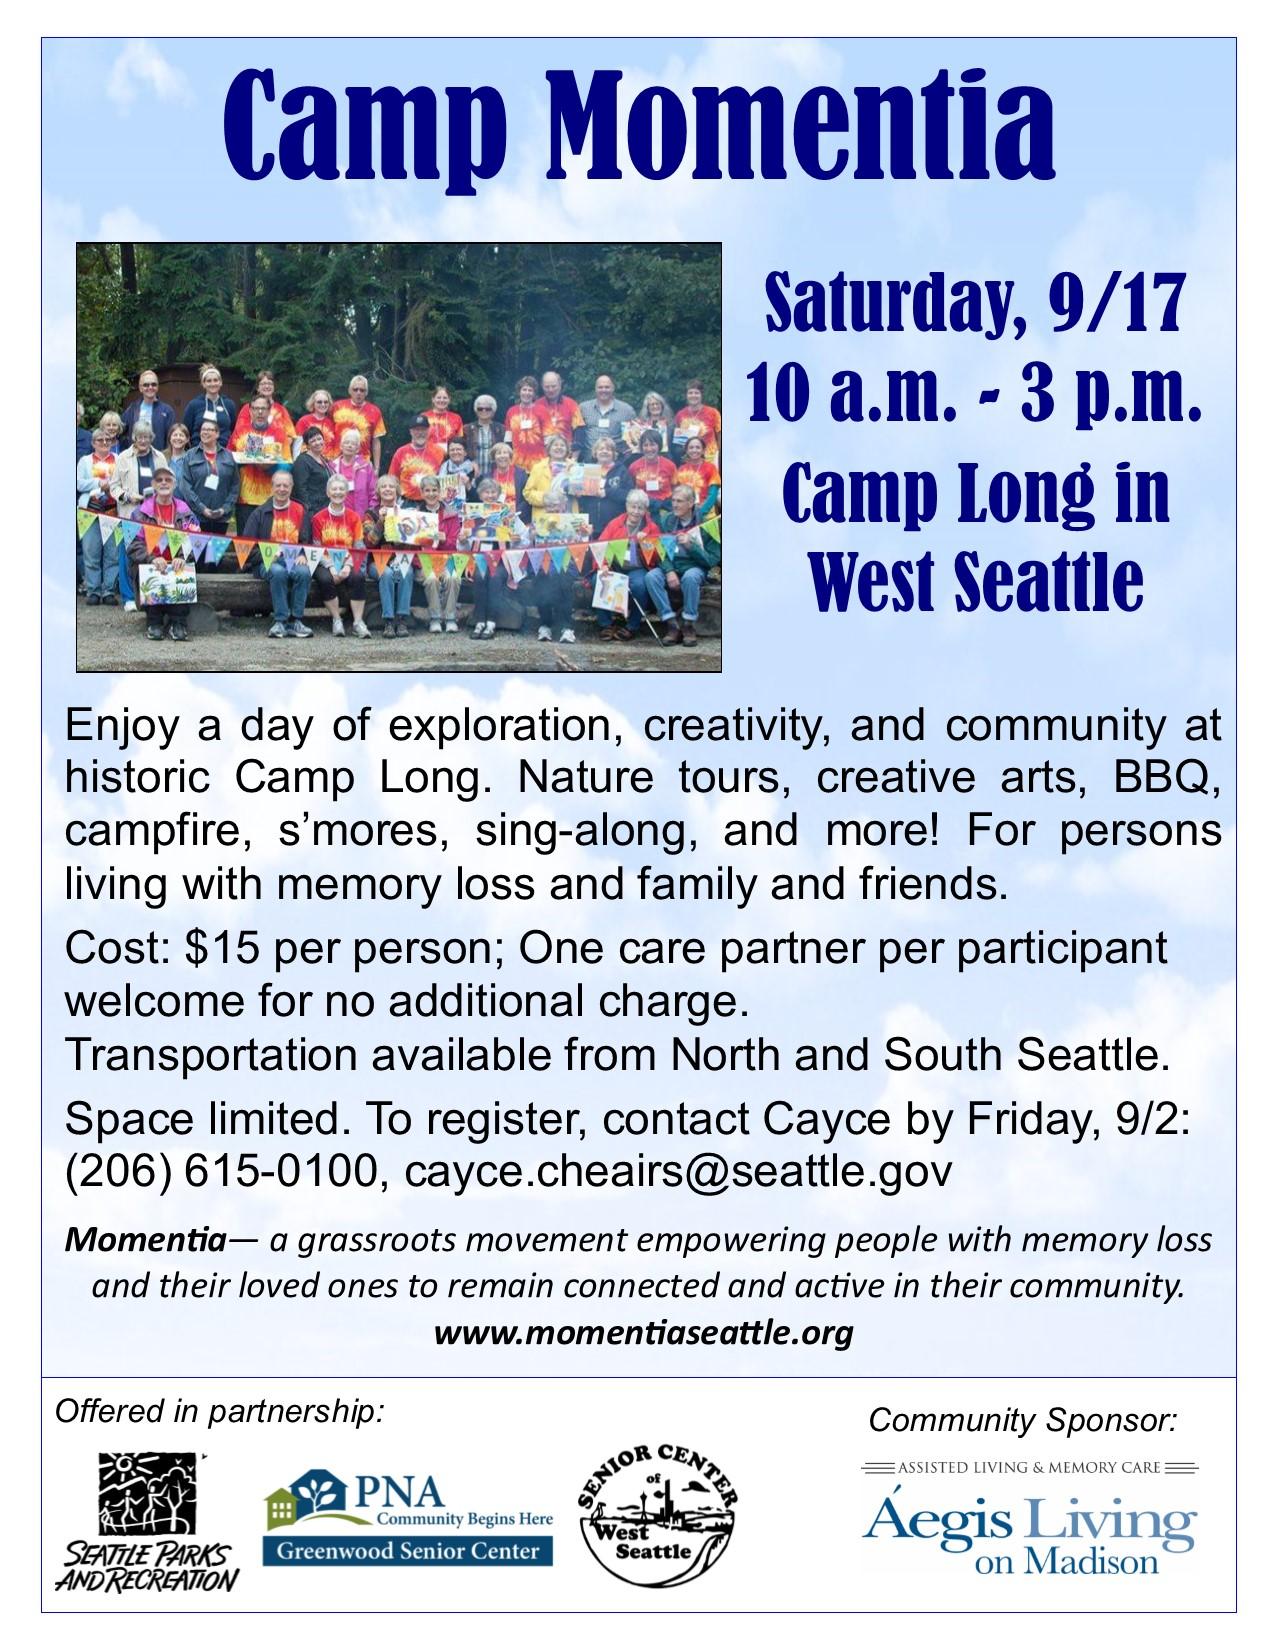 Camp Momentia Flyer 2016.jpg